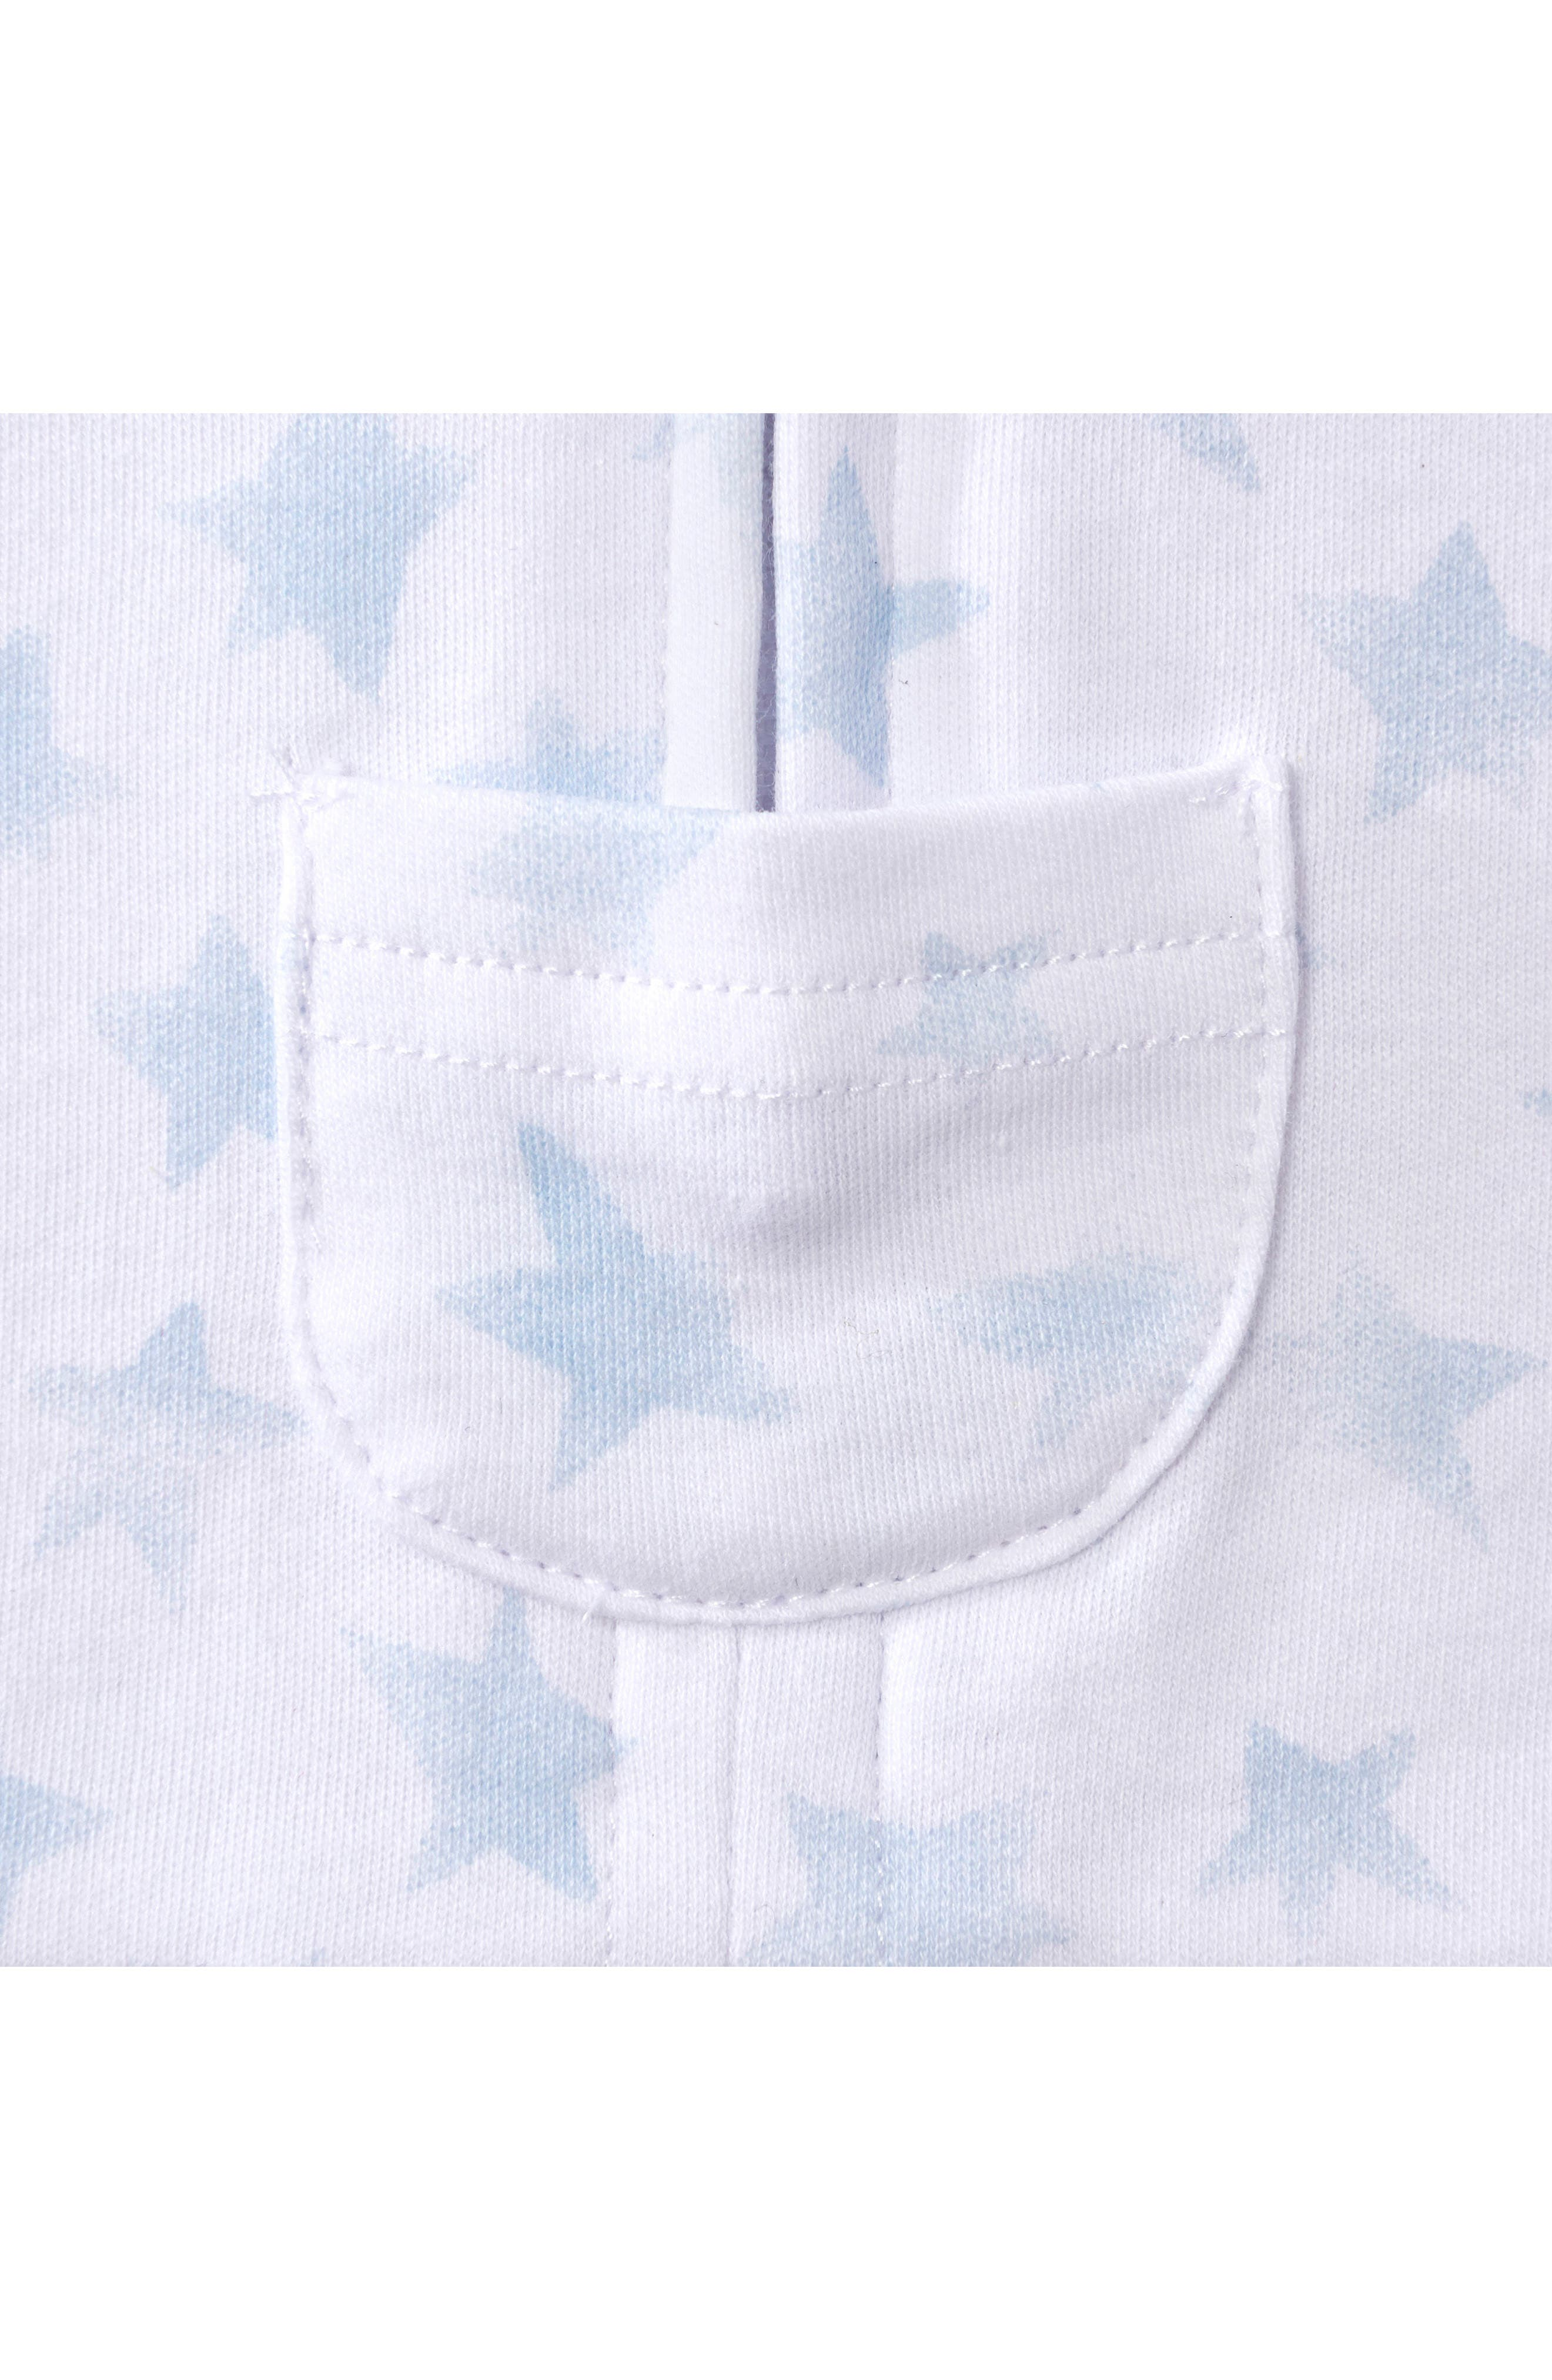 Platinum Series SleepSack<sup>™</sup> Swaddle,                             Alternate thumbnail 5, color,                             Pale Blue Twinkle